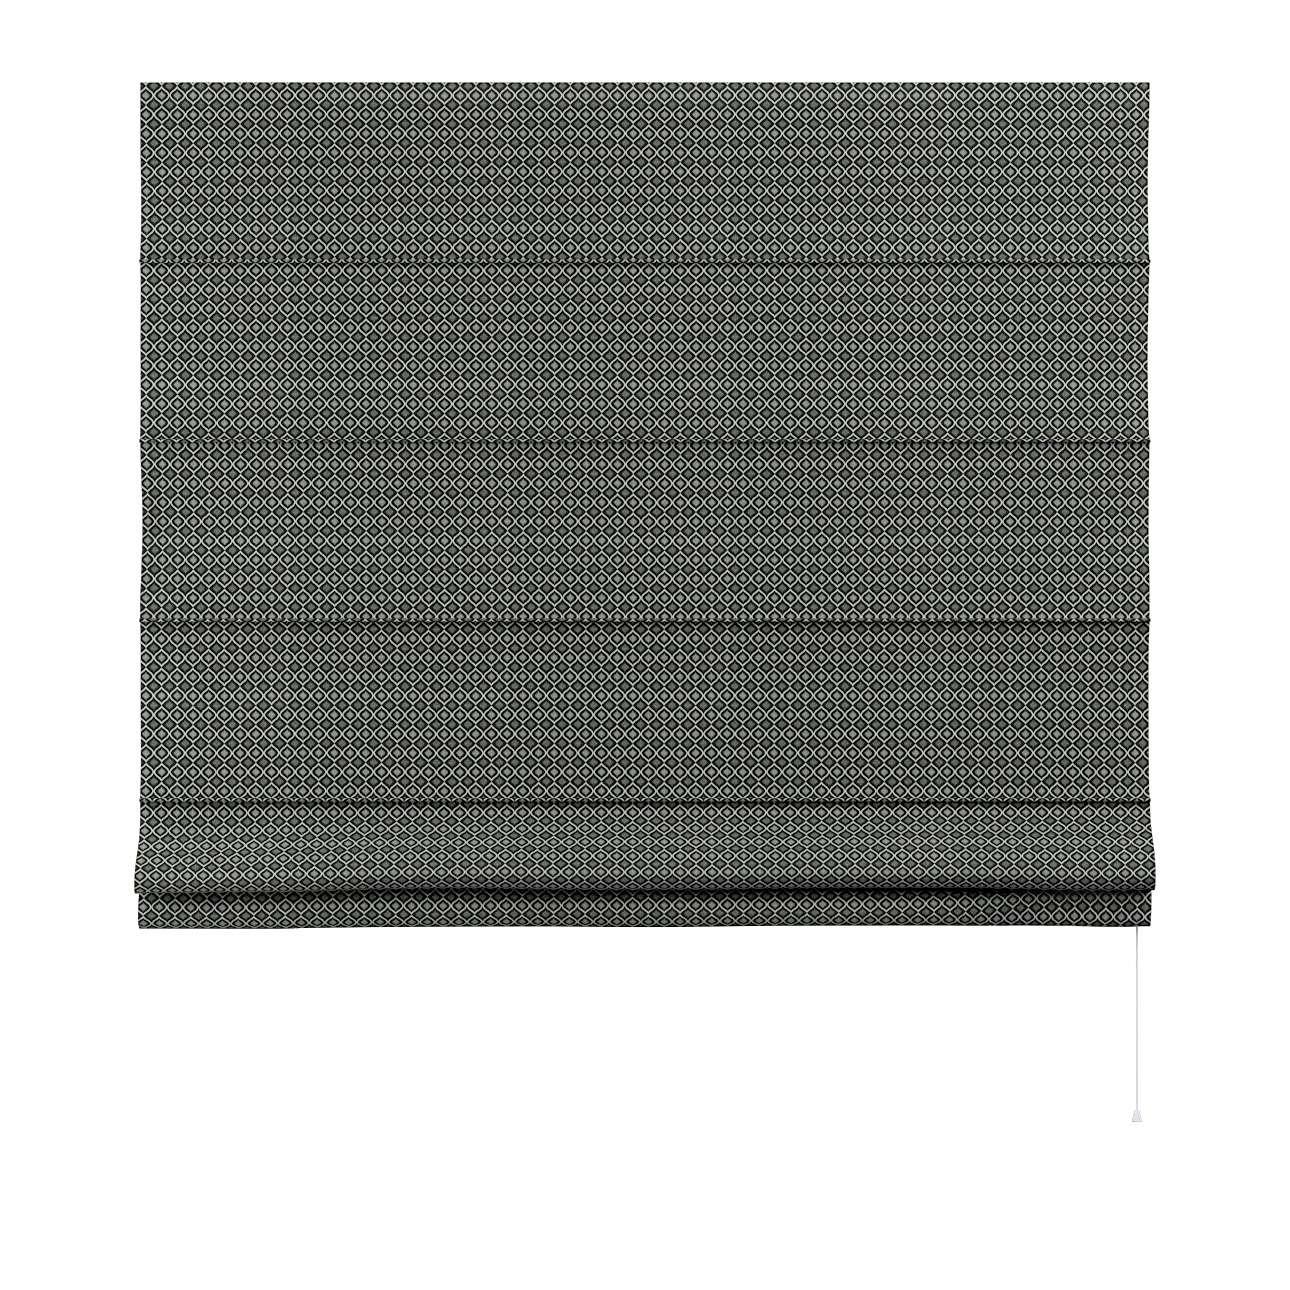 Vouwgordijn Capri van de collectie Black & White, Stof: 142-86